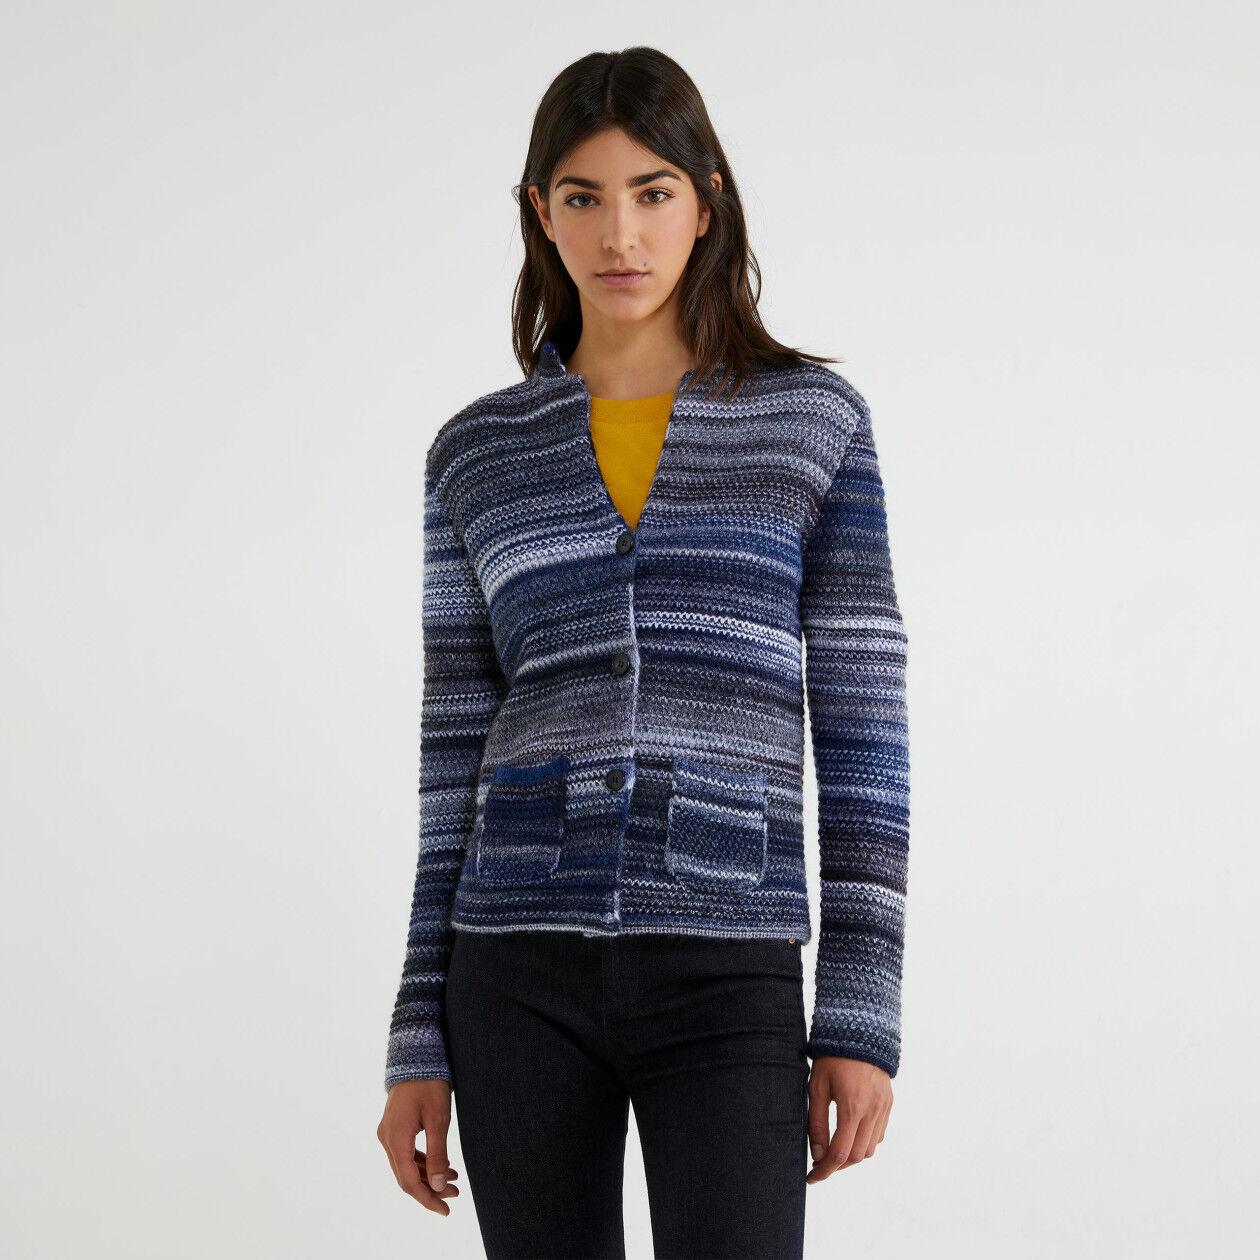 Multi-color knit jacket